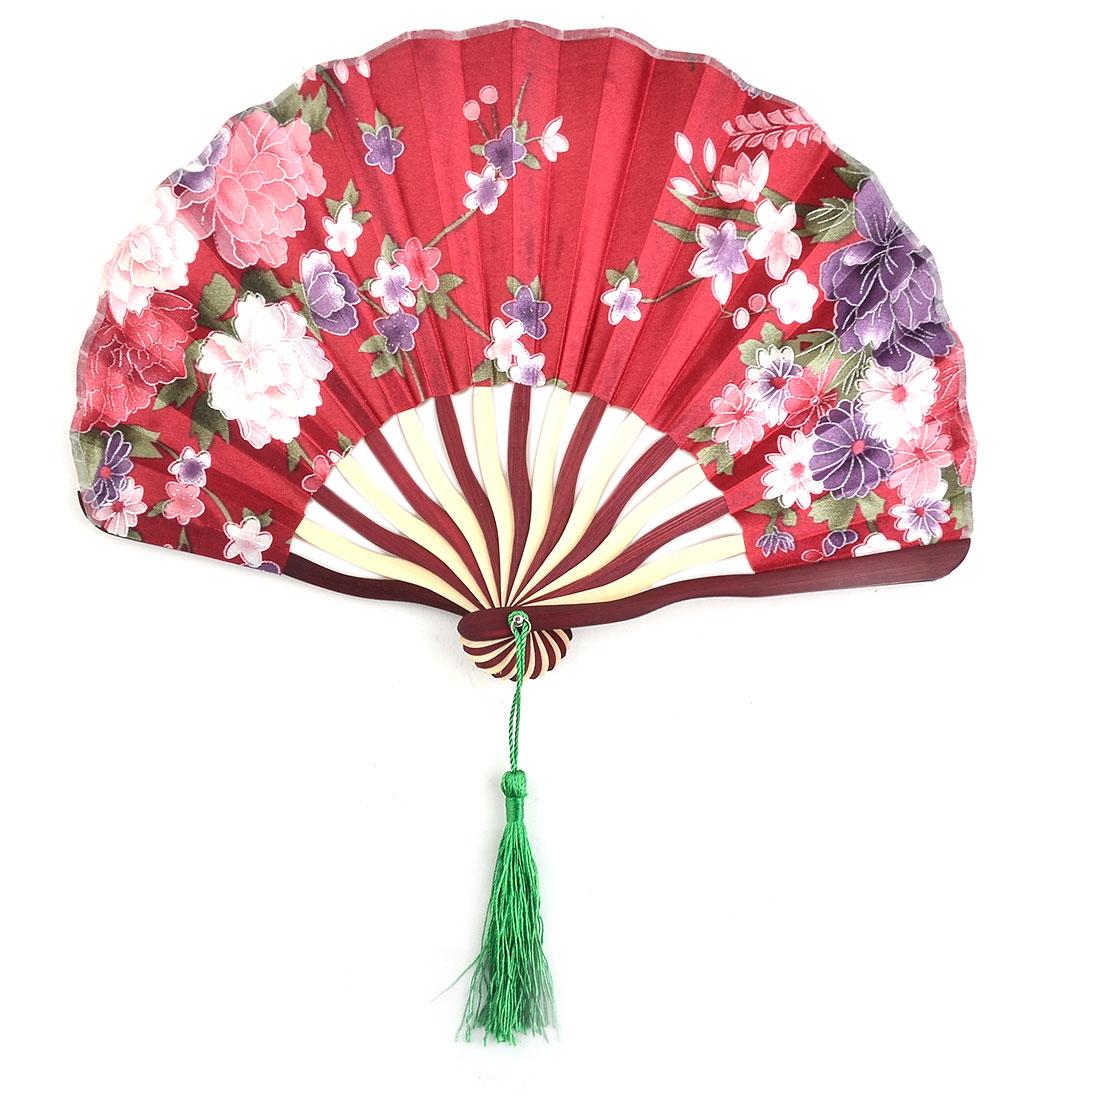 Home Polyester Flower Print Tassel Decor Handicraft Handheld Hand Fan Burgundy